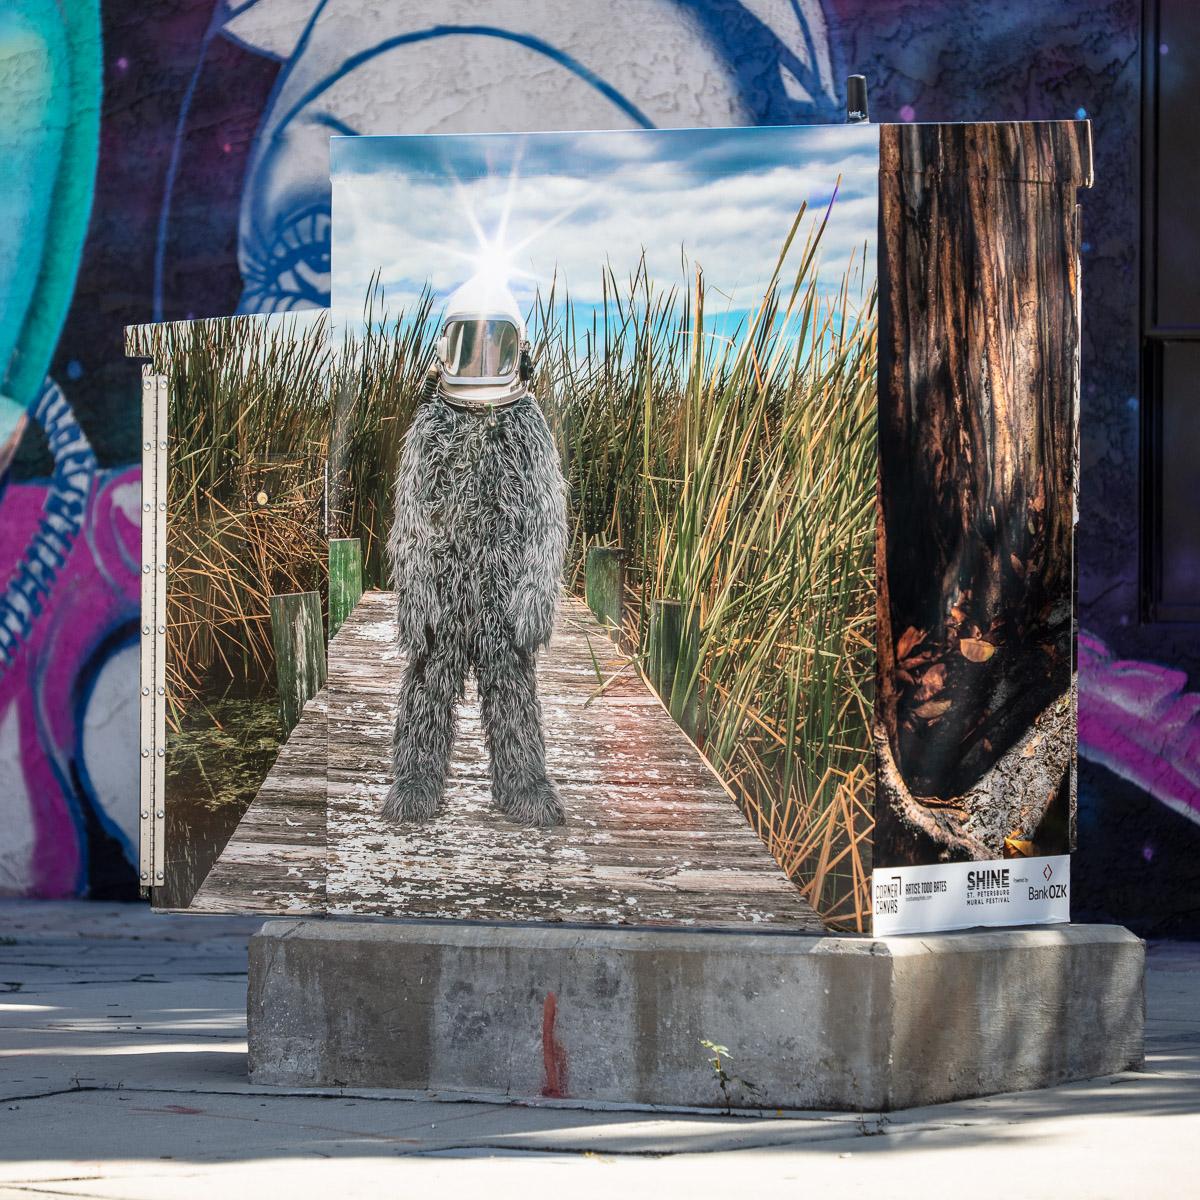 todd-bates-photoghraphy_shine-mural-festival_corner-canvas_St-pete.jpg